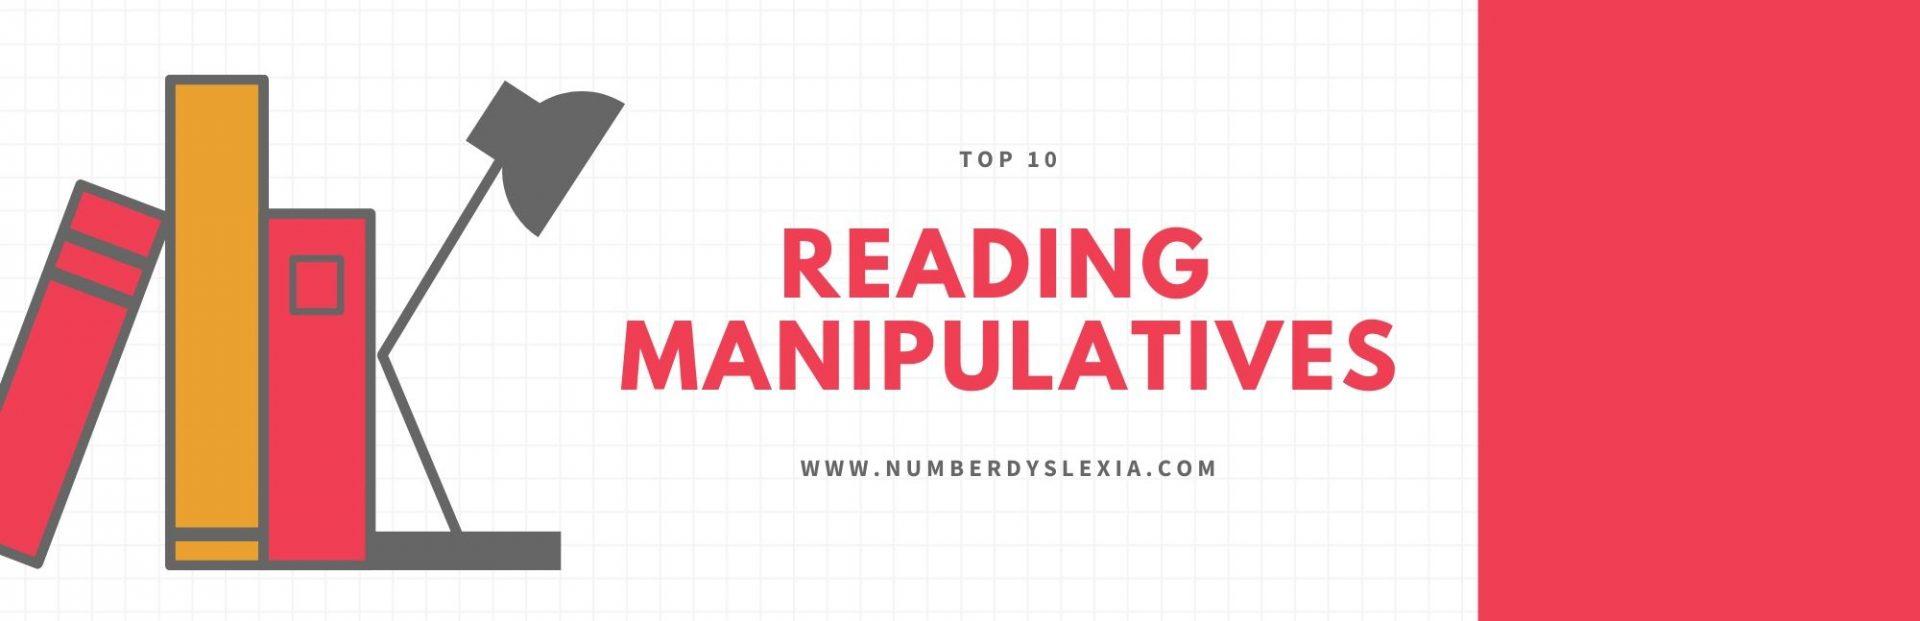 list of top 10 reading manipulatives